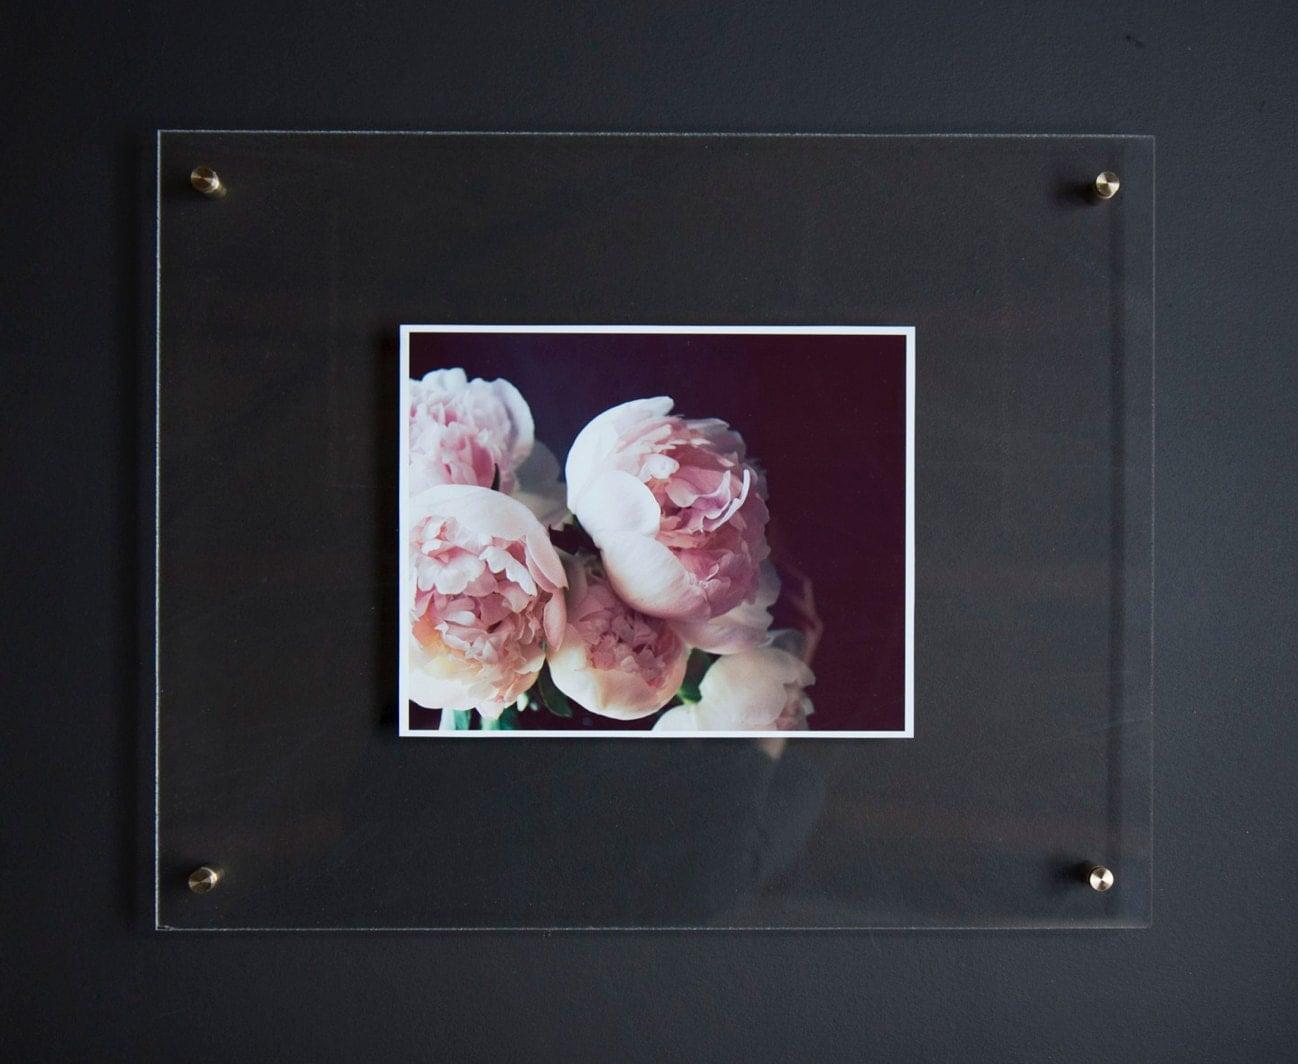 16x20 acrylic frame kit zoom